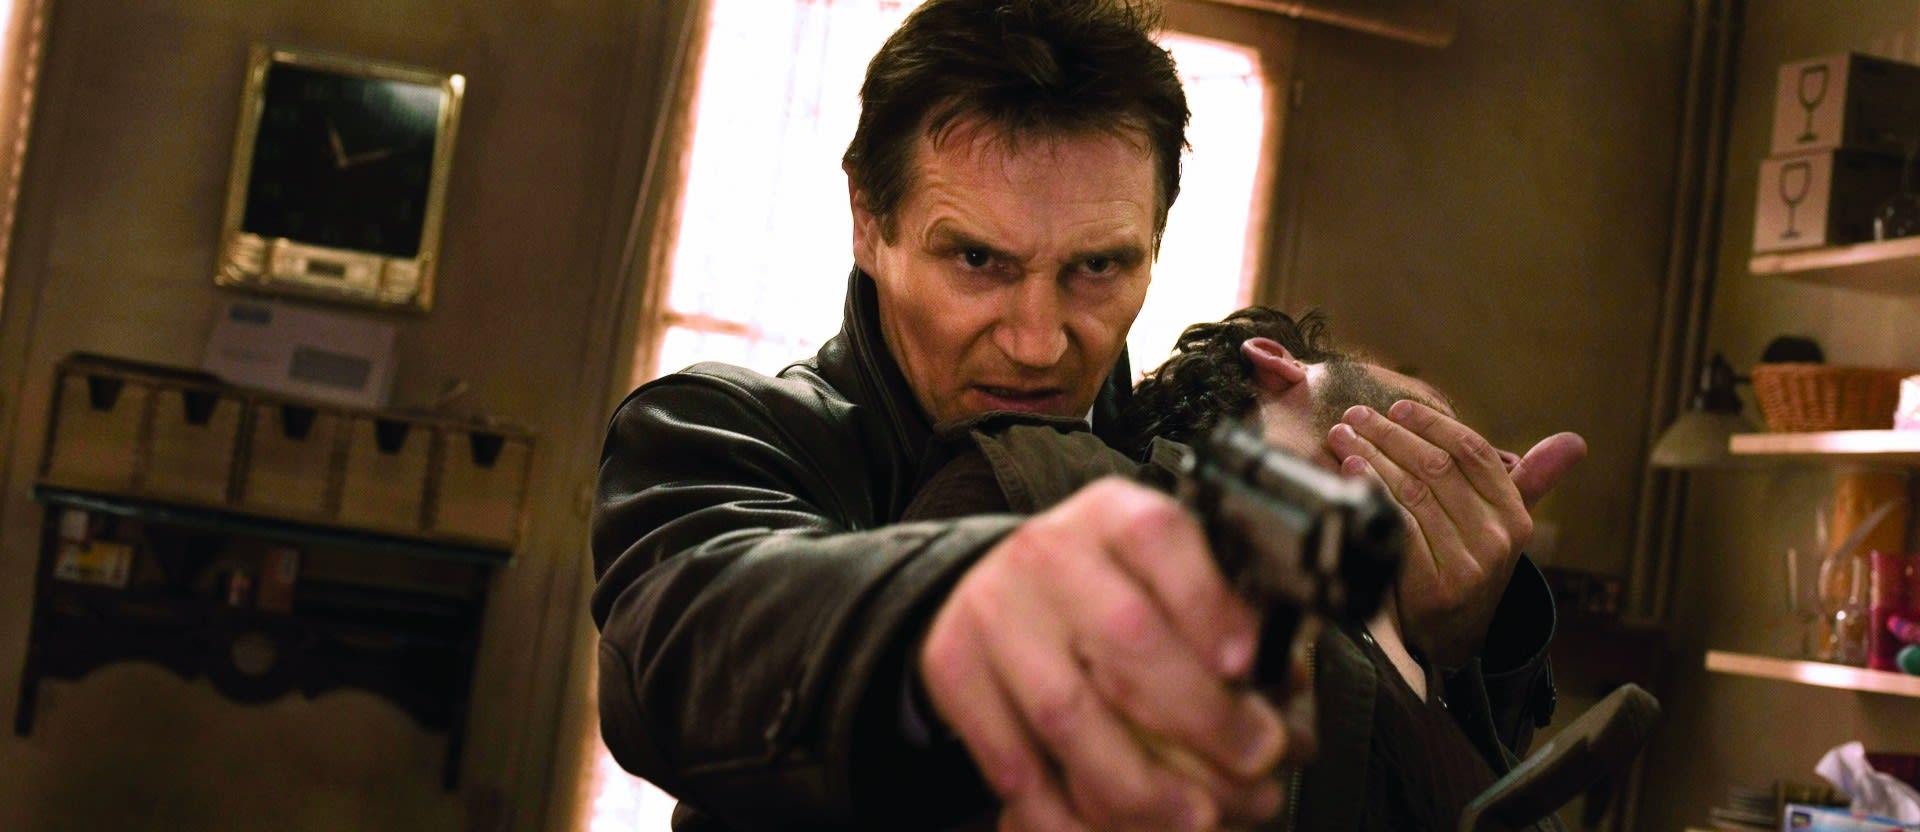 Dads on Film Liam Neeson as Bryan Mills Taken